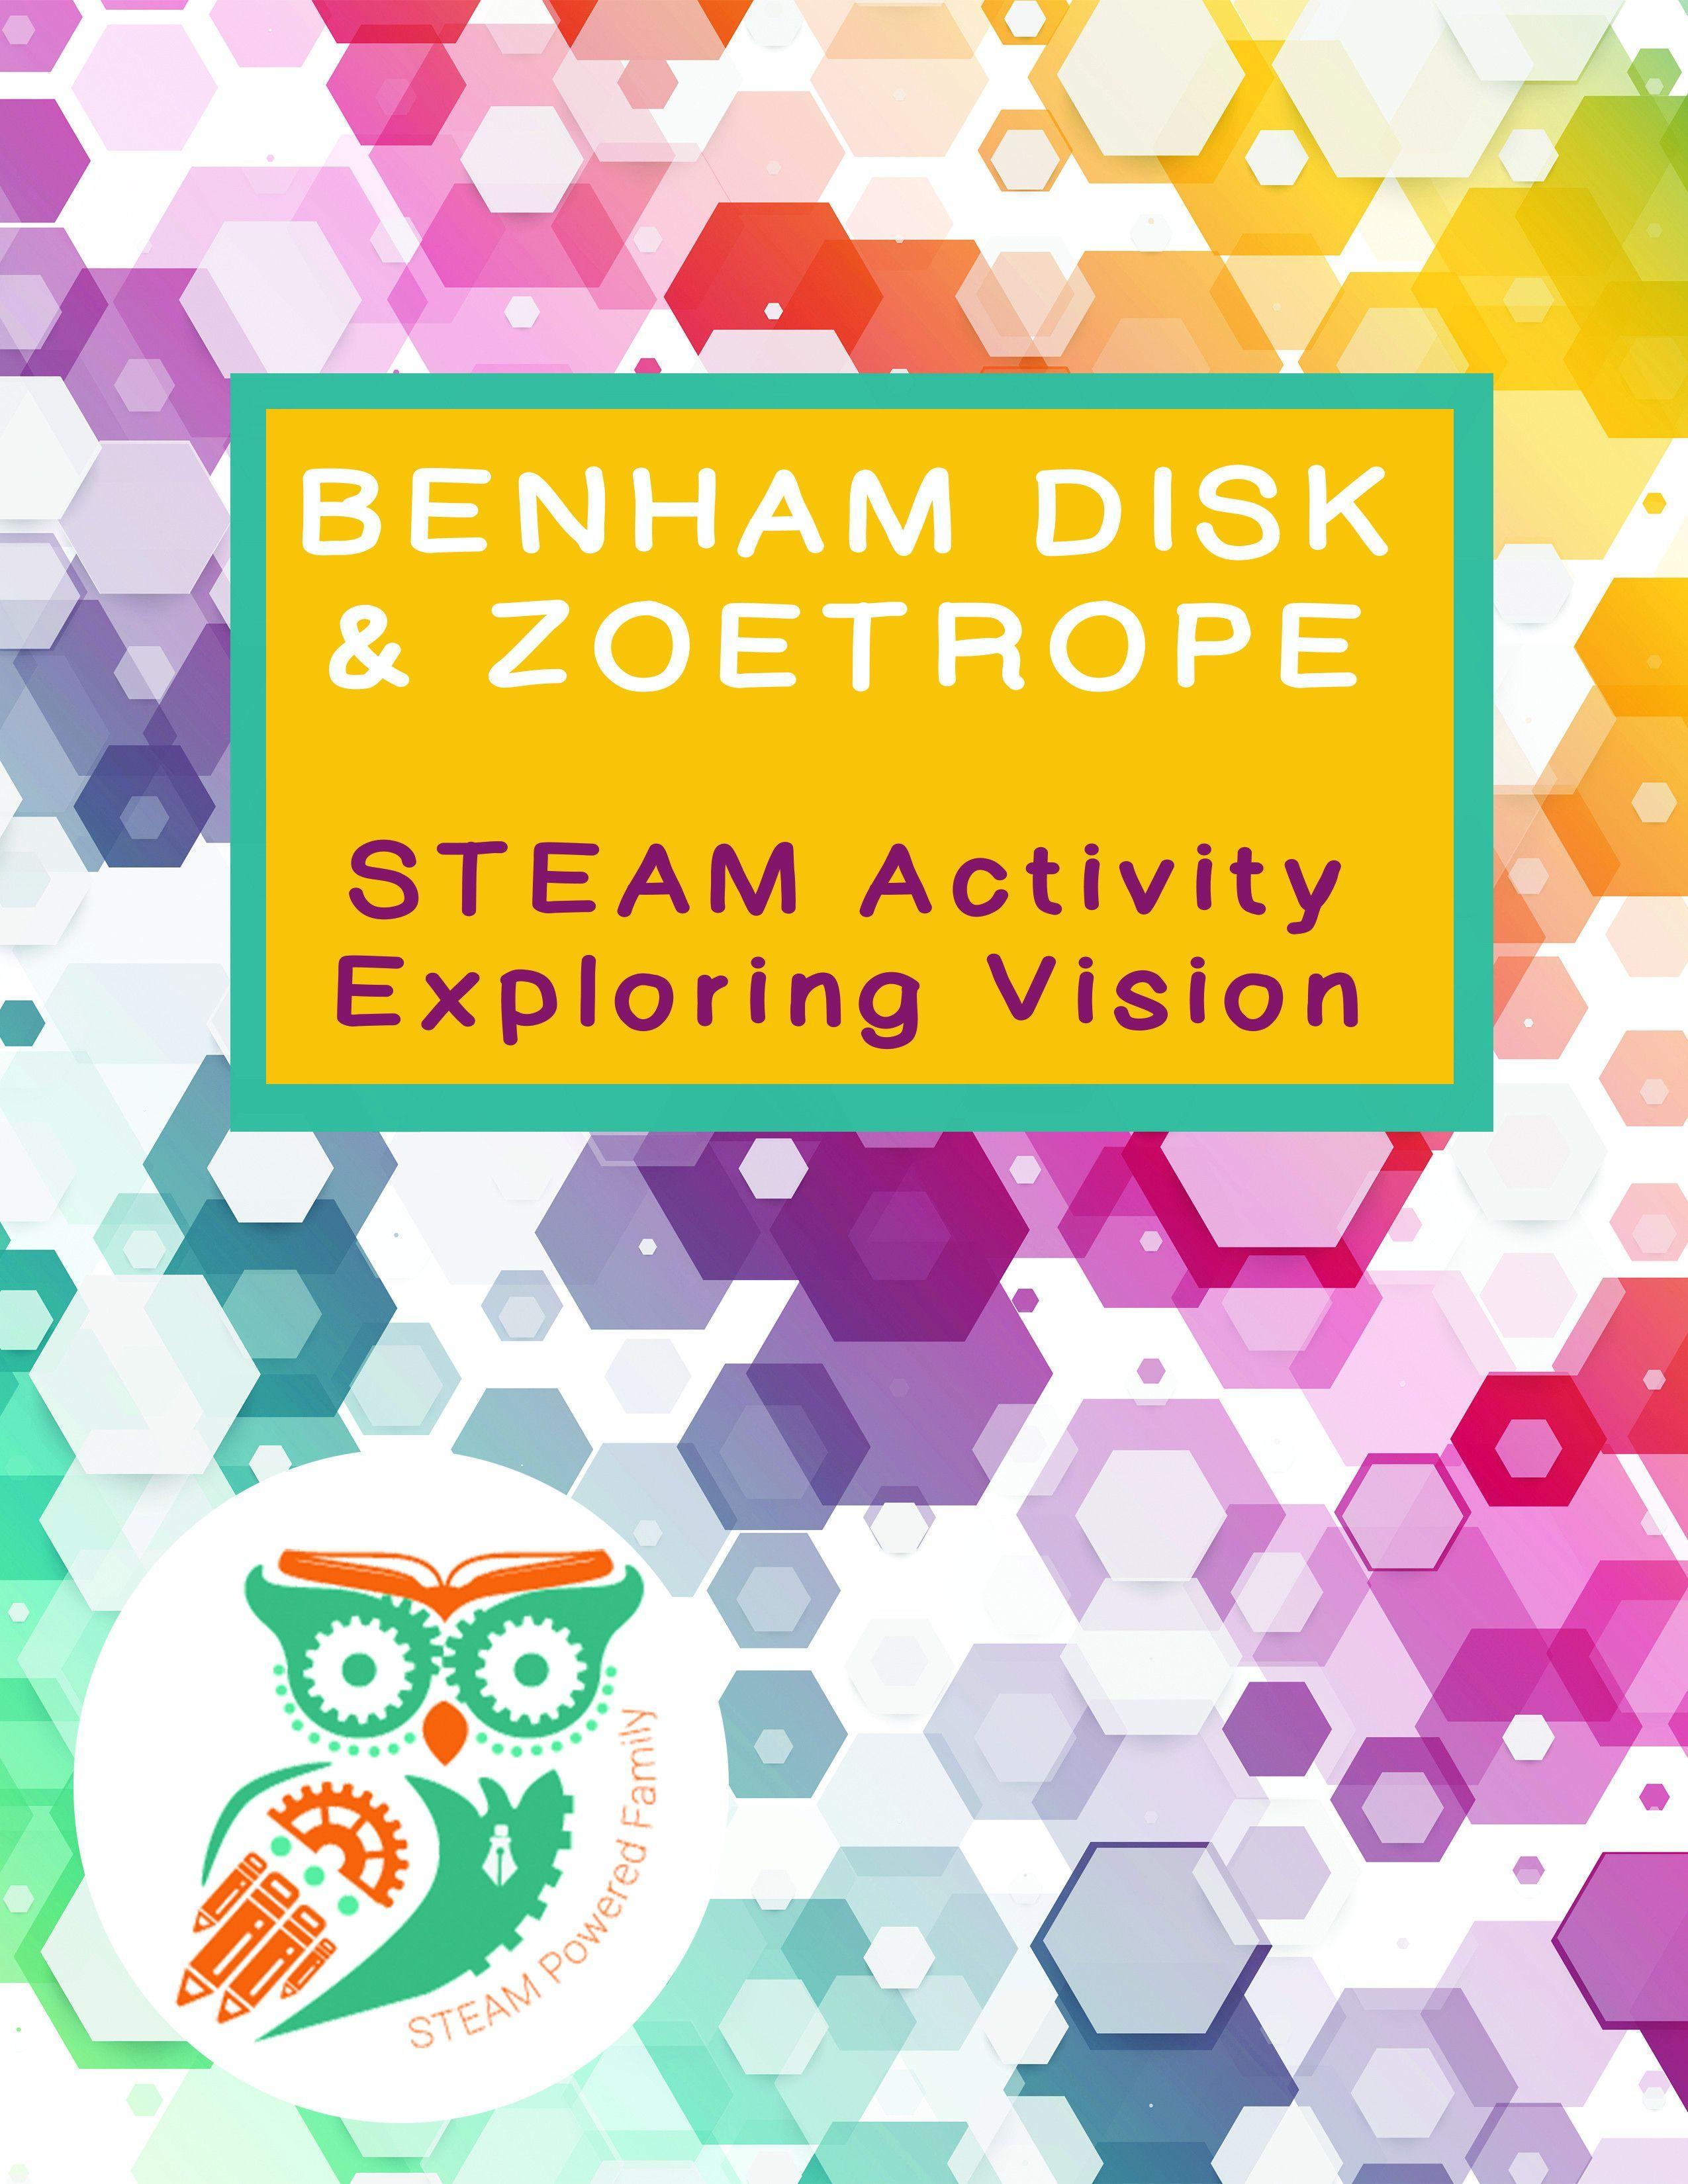 Benham Disk And Zoetrope